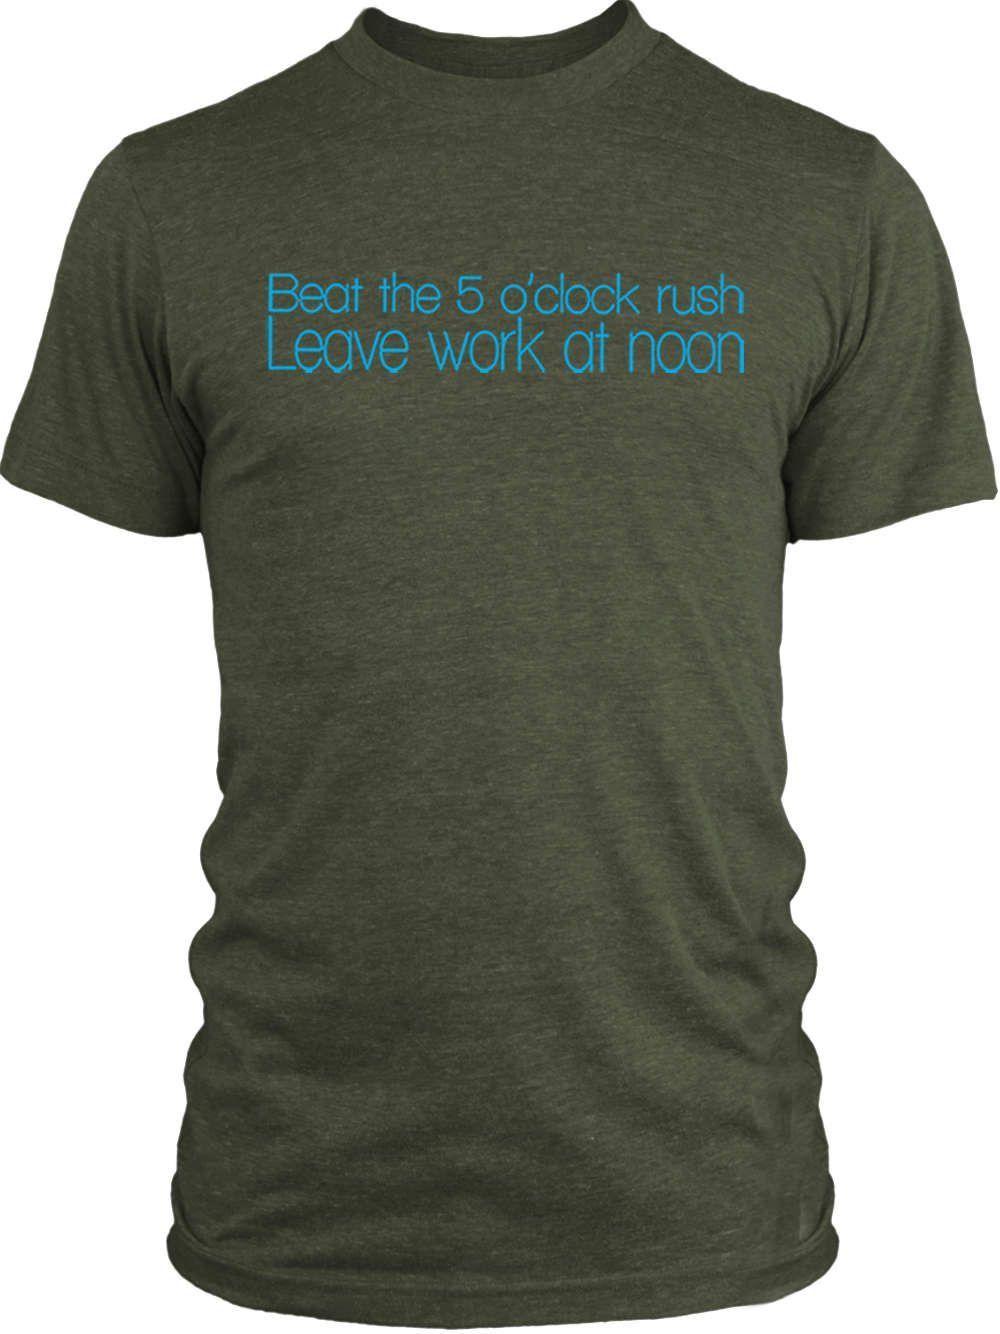 Big Texas Leave Work at Noon (Blue) Vintage Tri-Blend T-Shirt